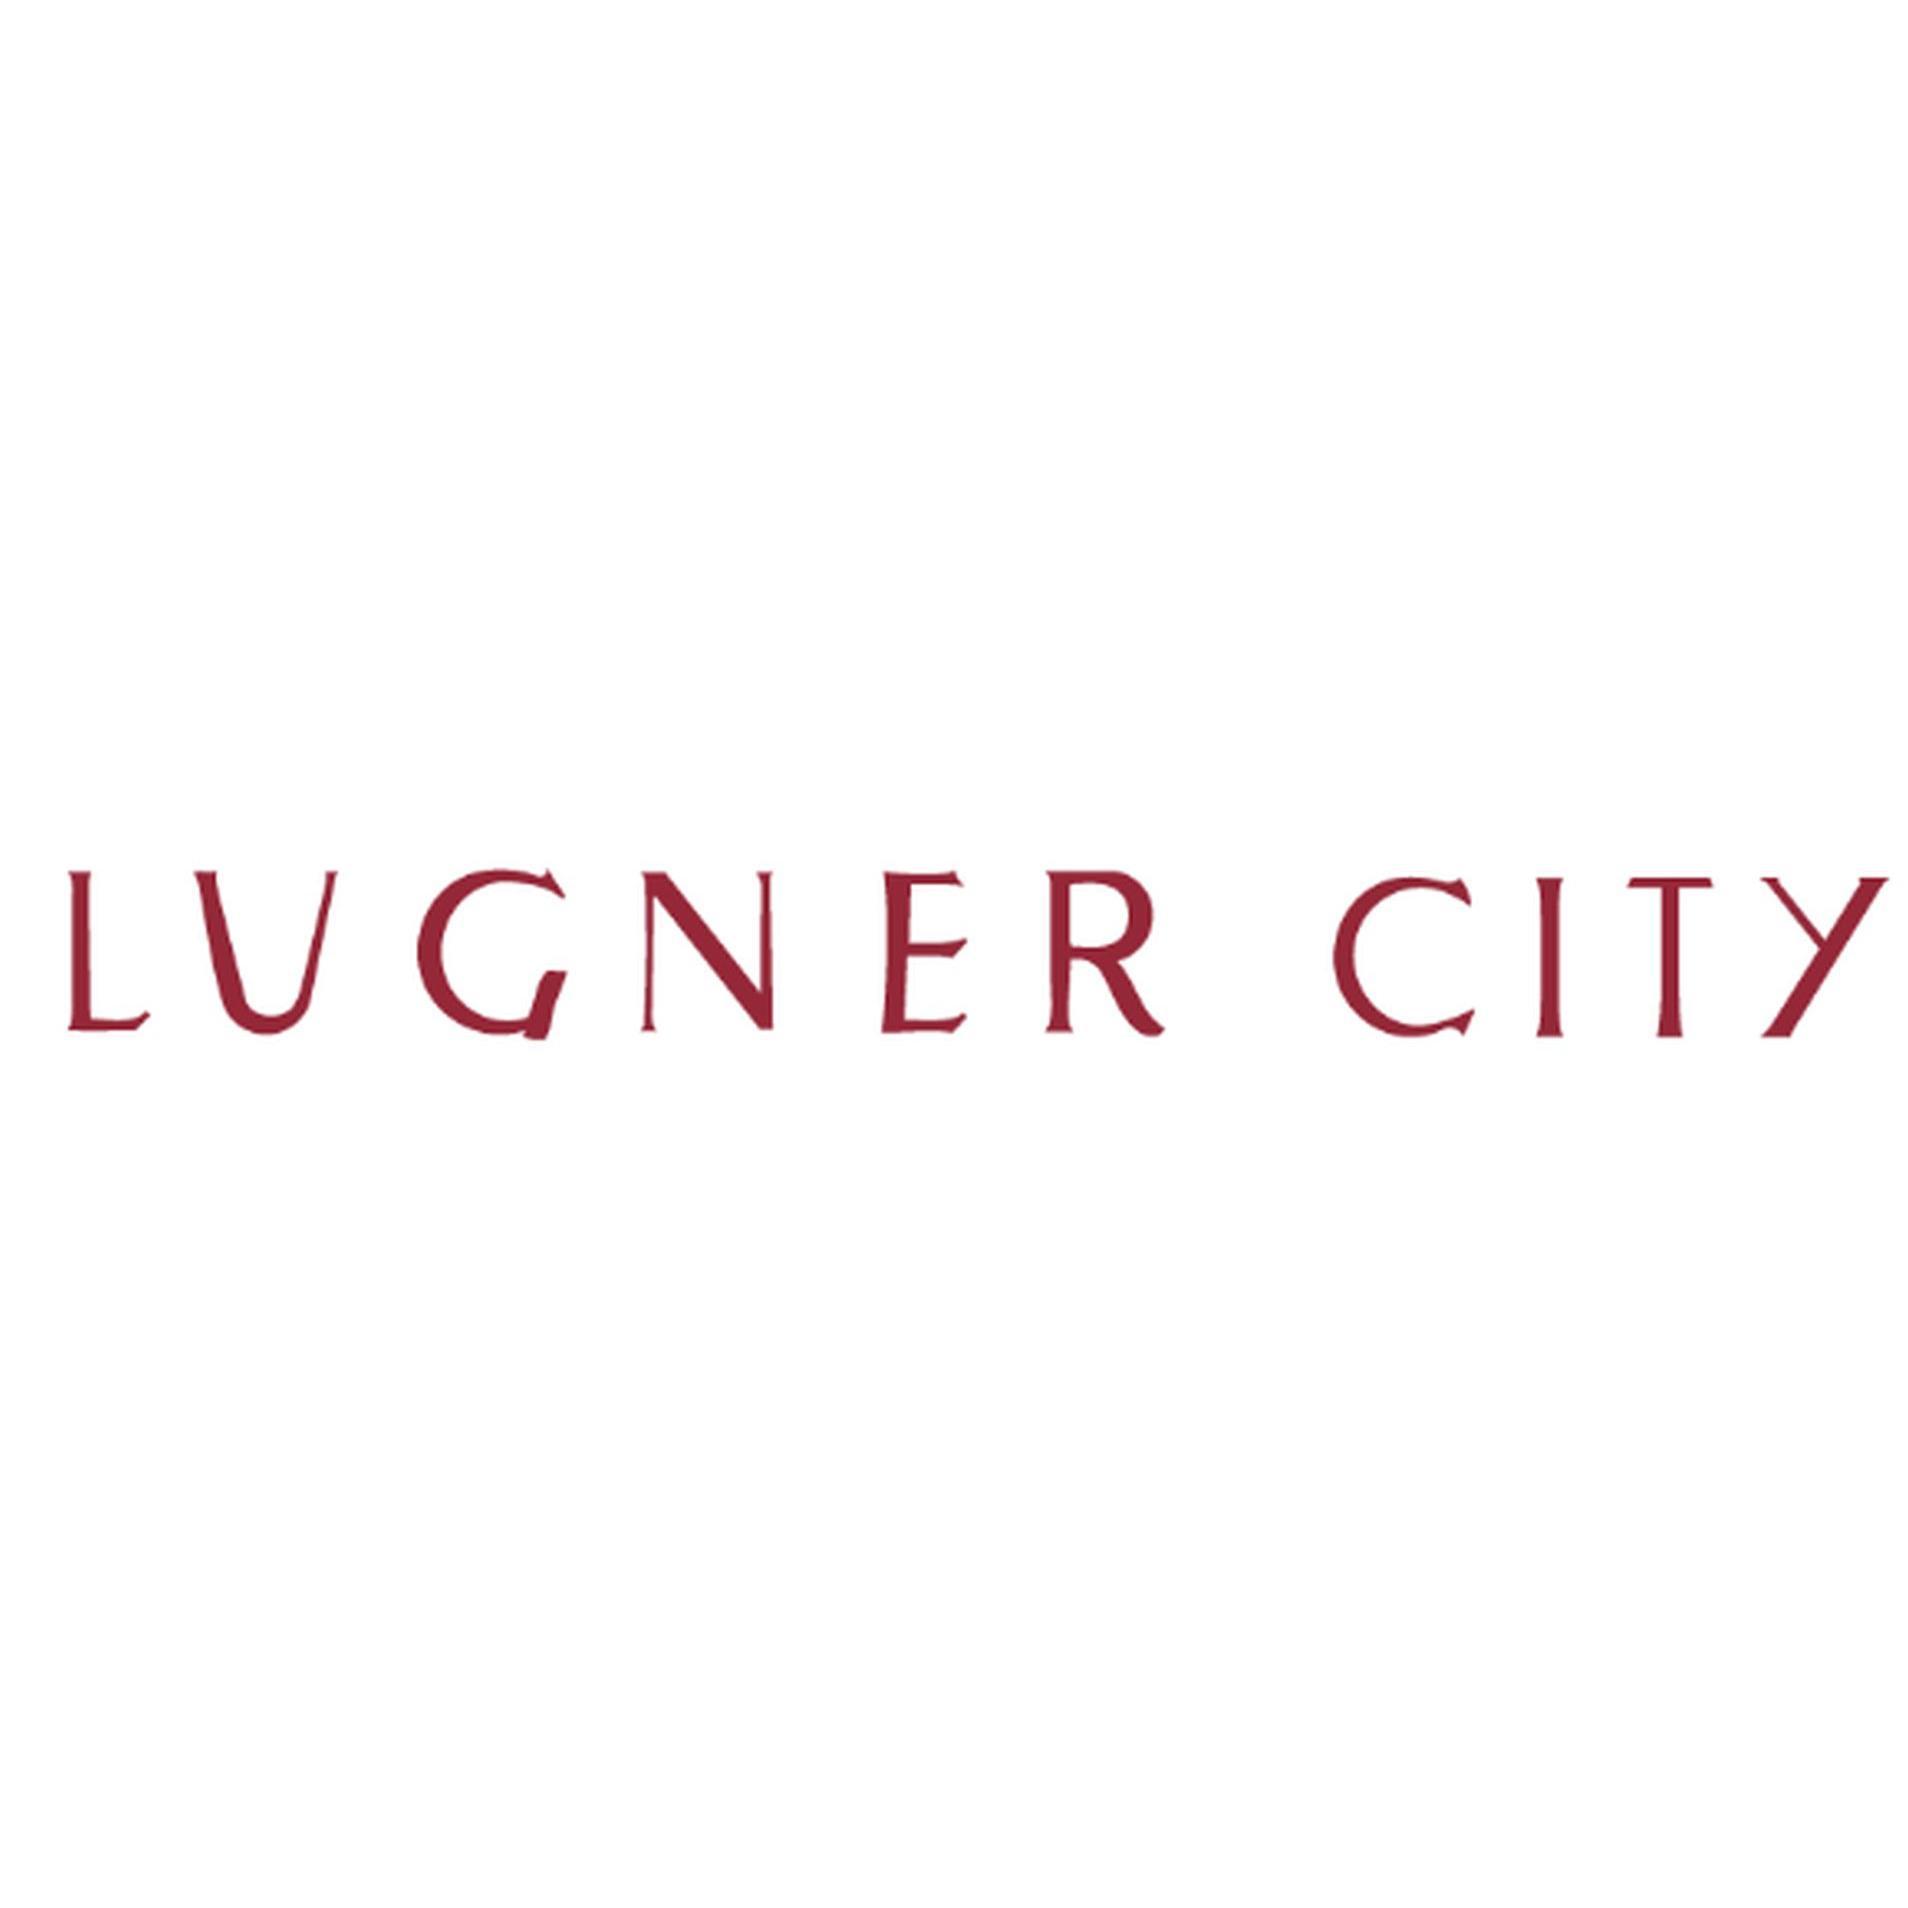 Lugner City